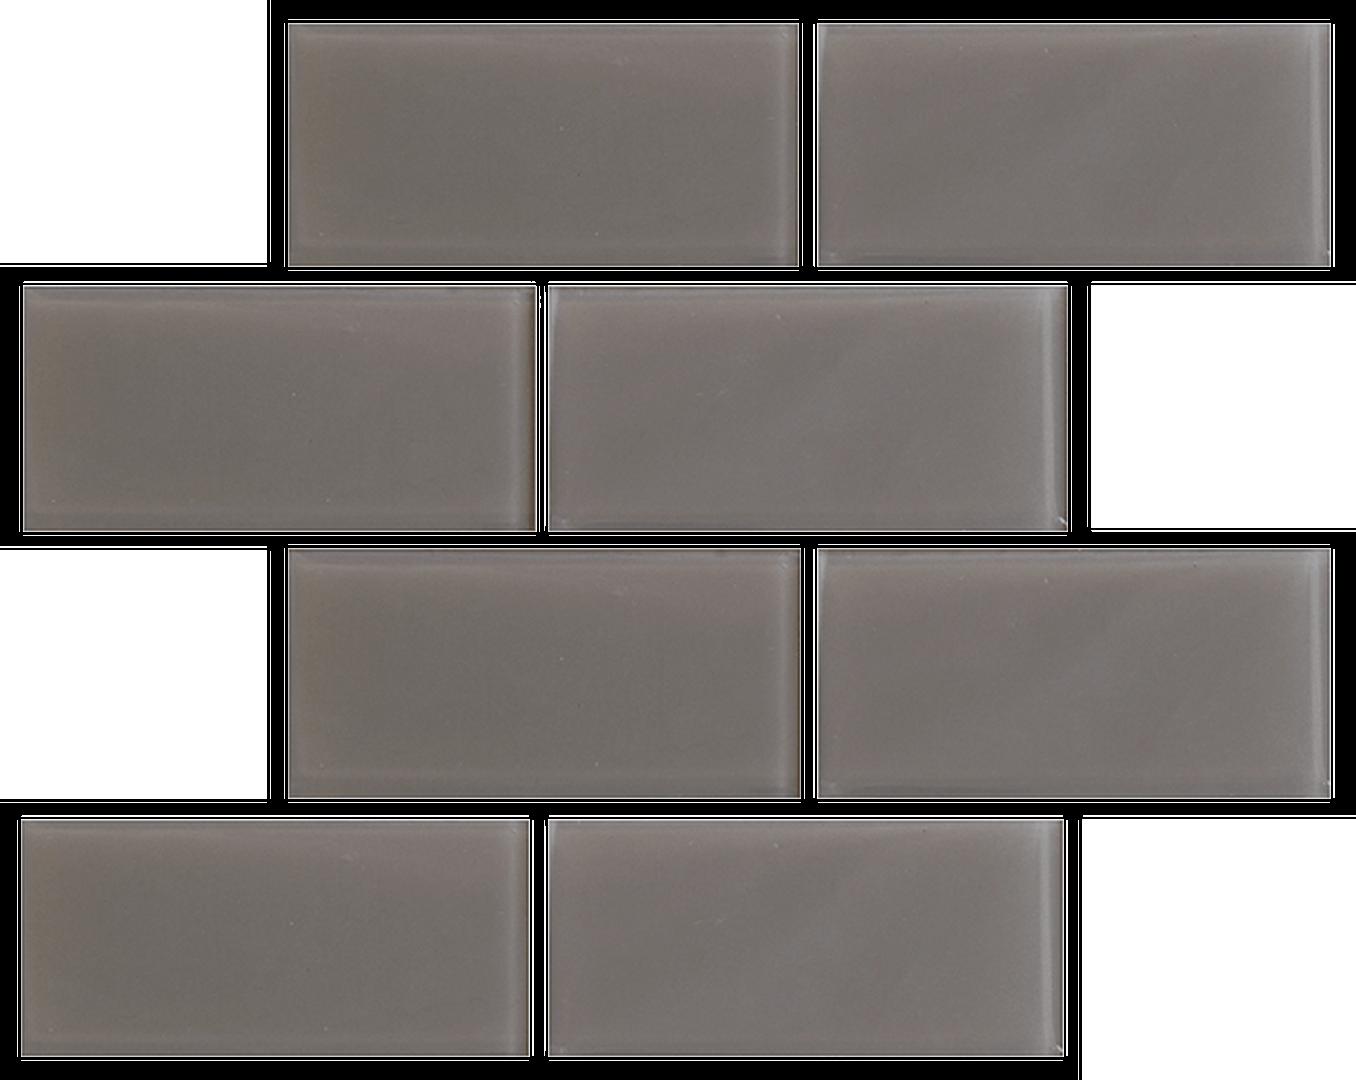 Crystal 3 x 6 Subway Tiles Hailstorm